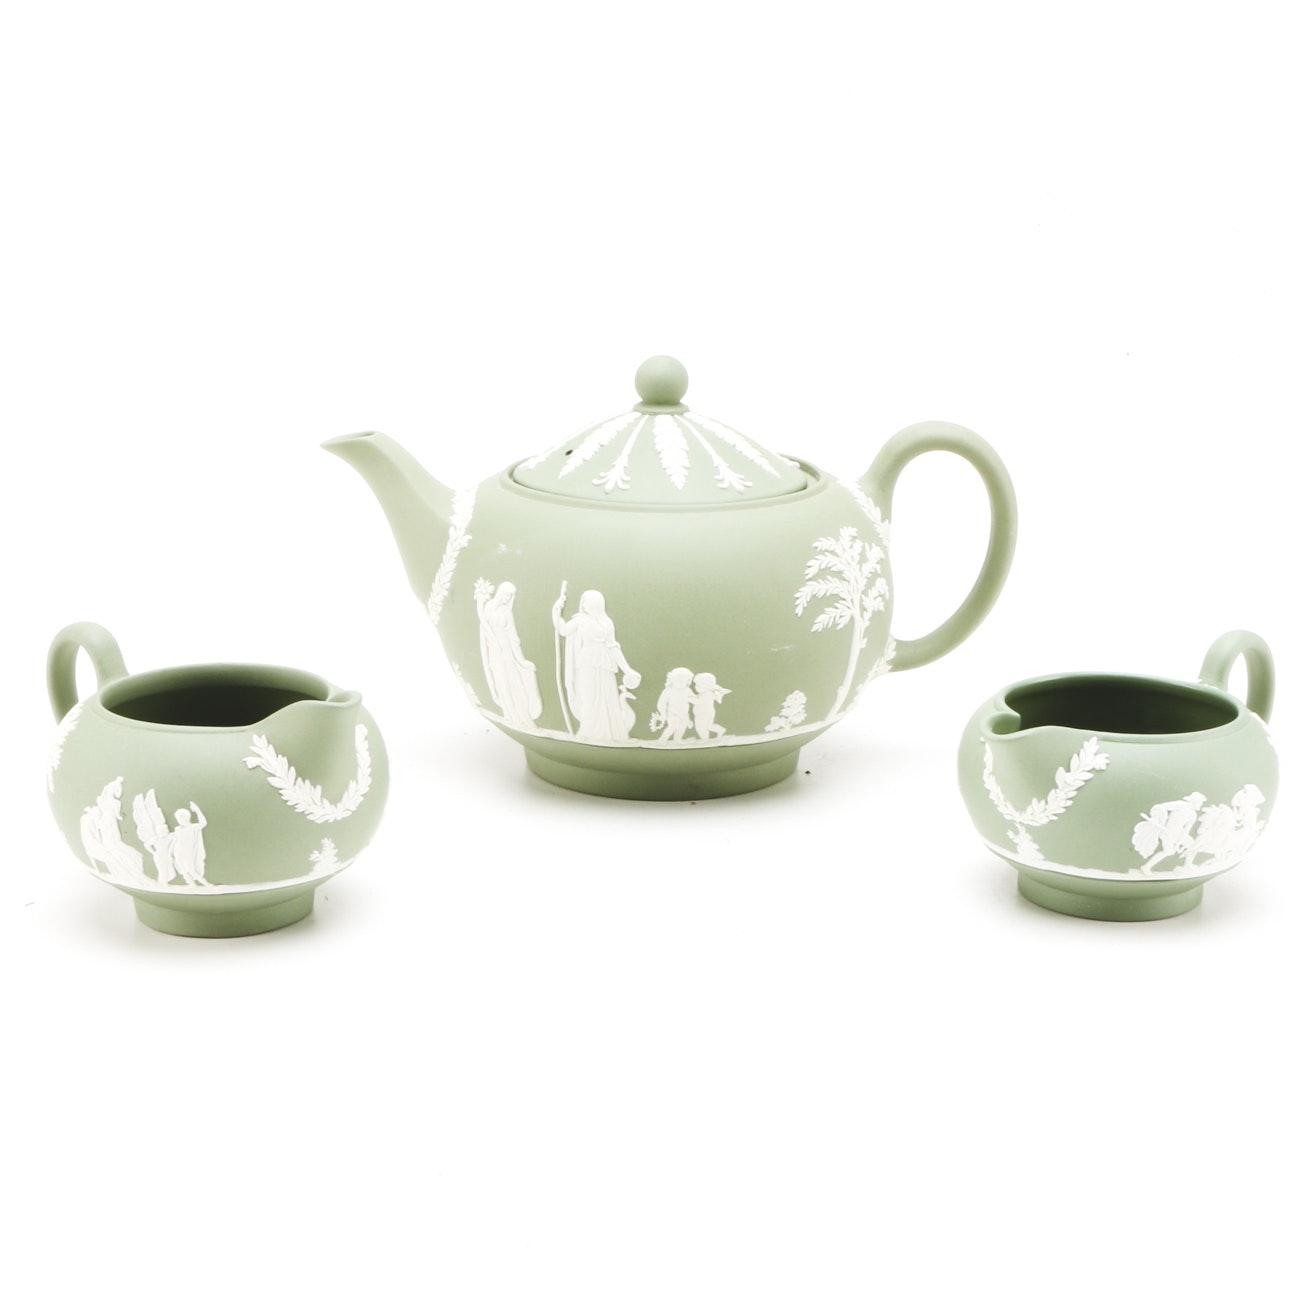 Wedgwood Jasperware Tea Pot and Creamers